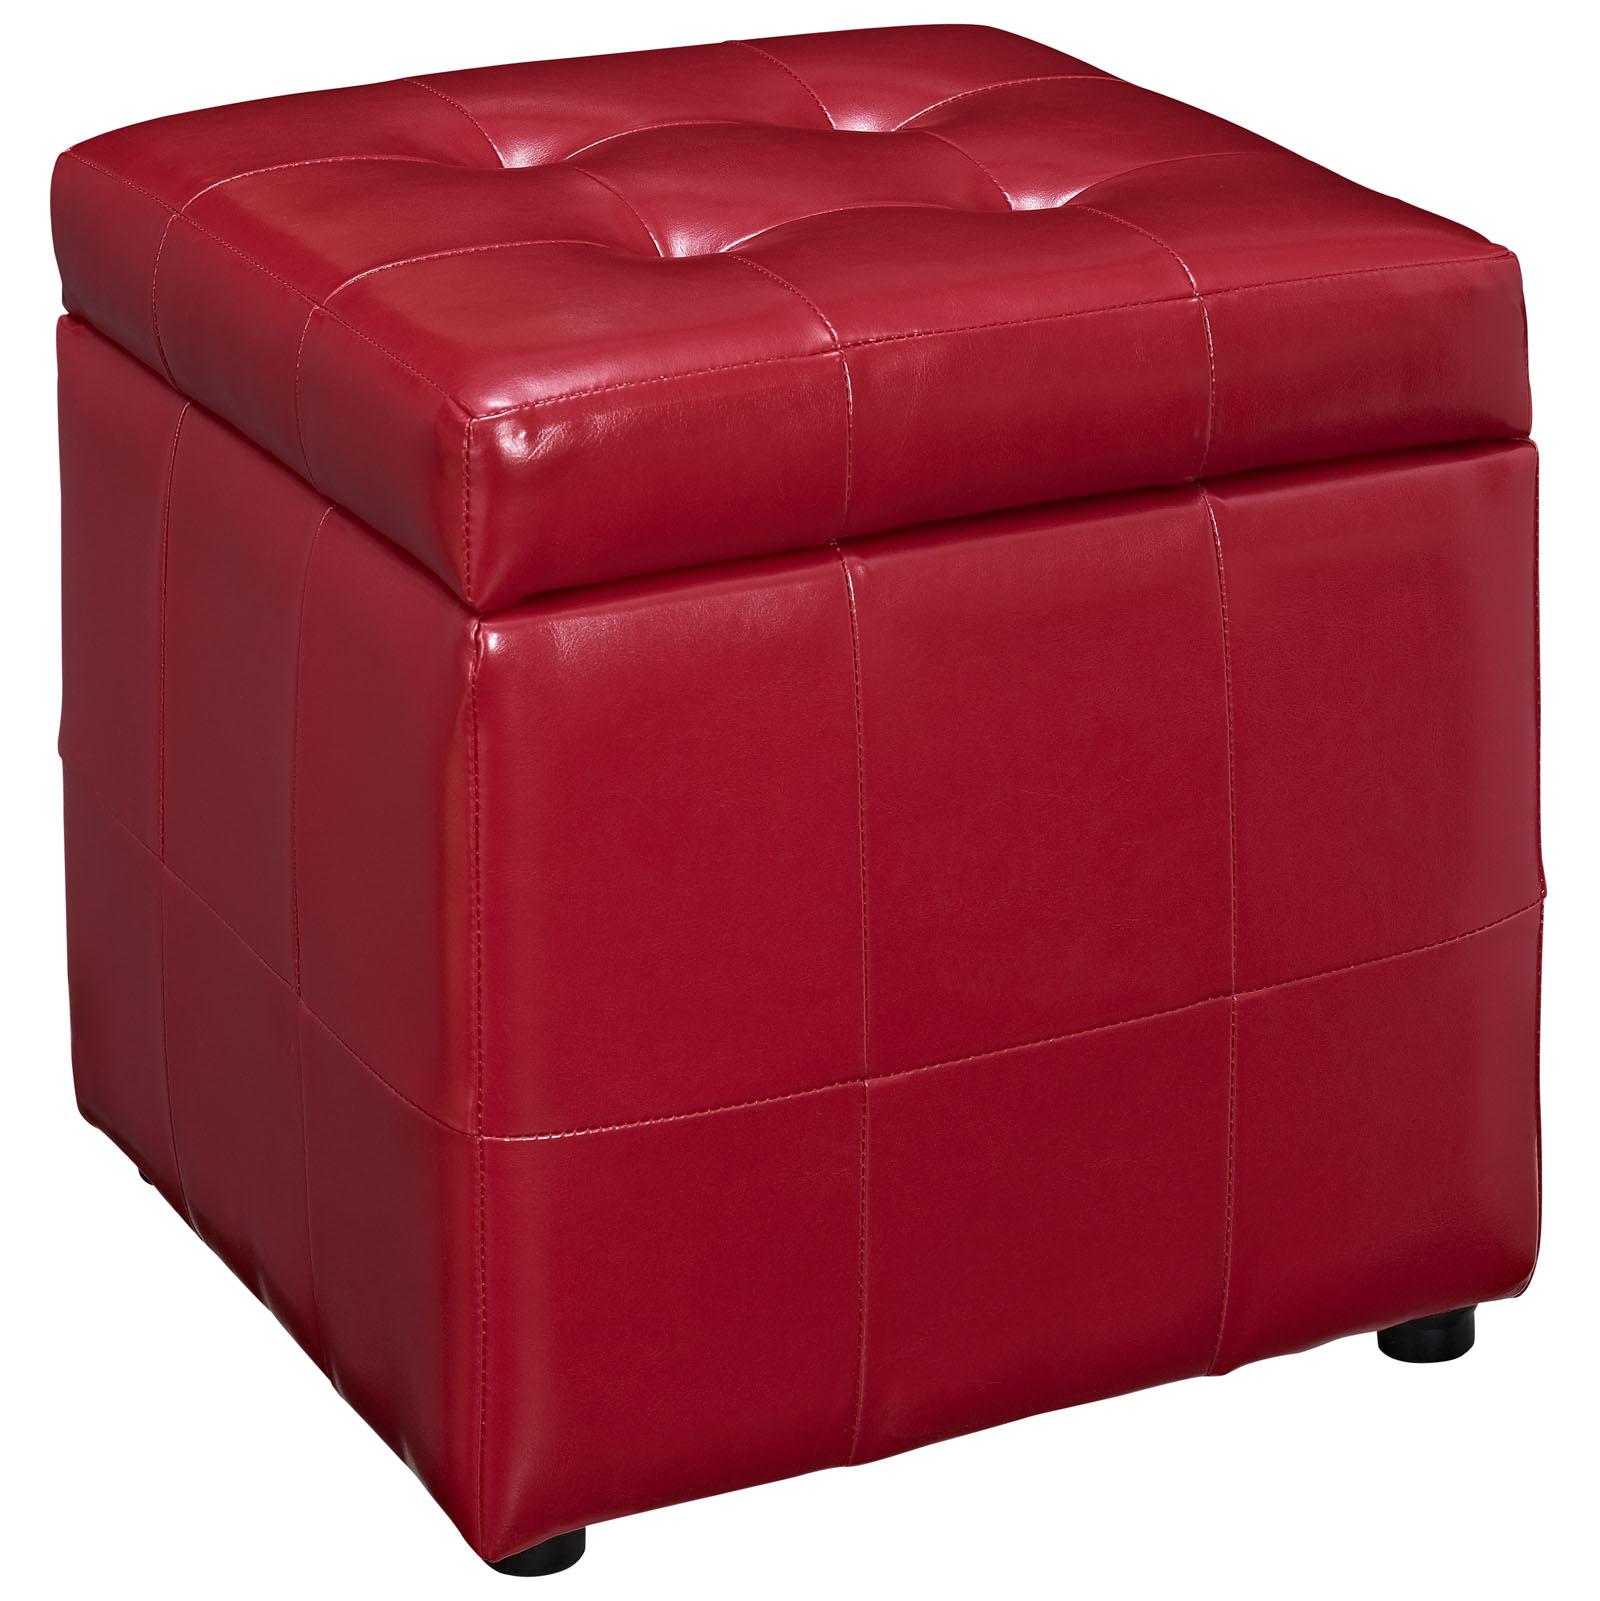 Volt Storage Upholstered Vinyl Ottoman Red